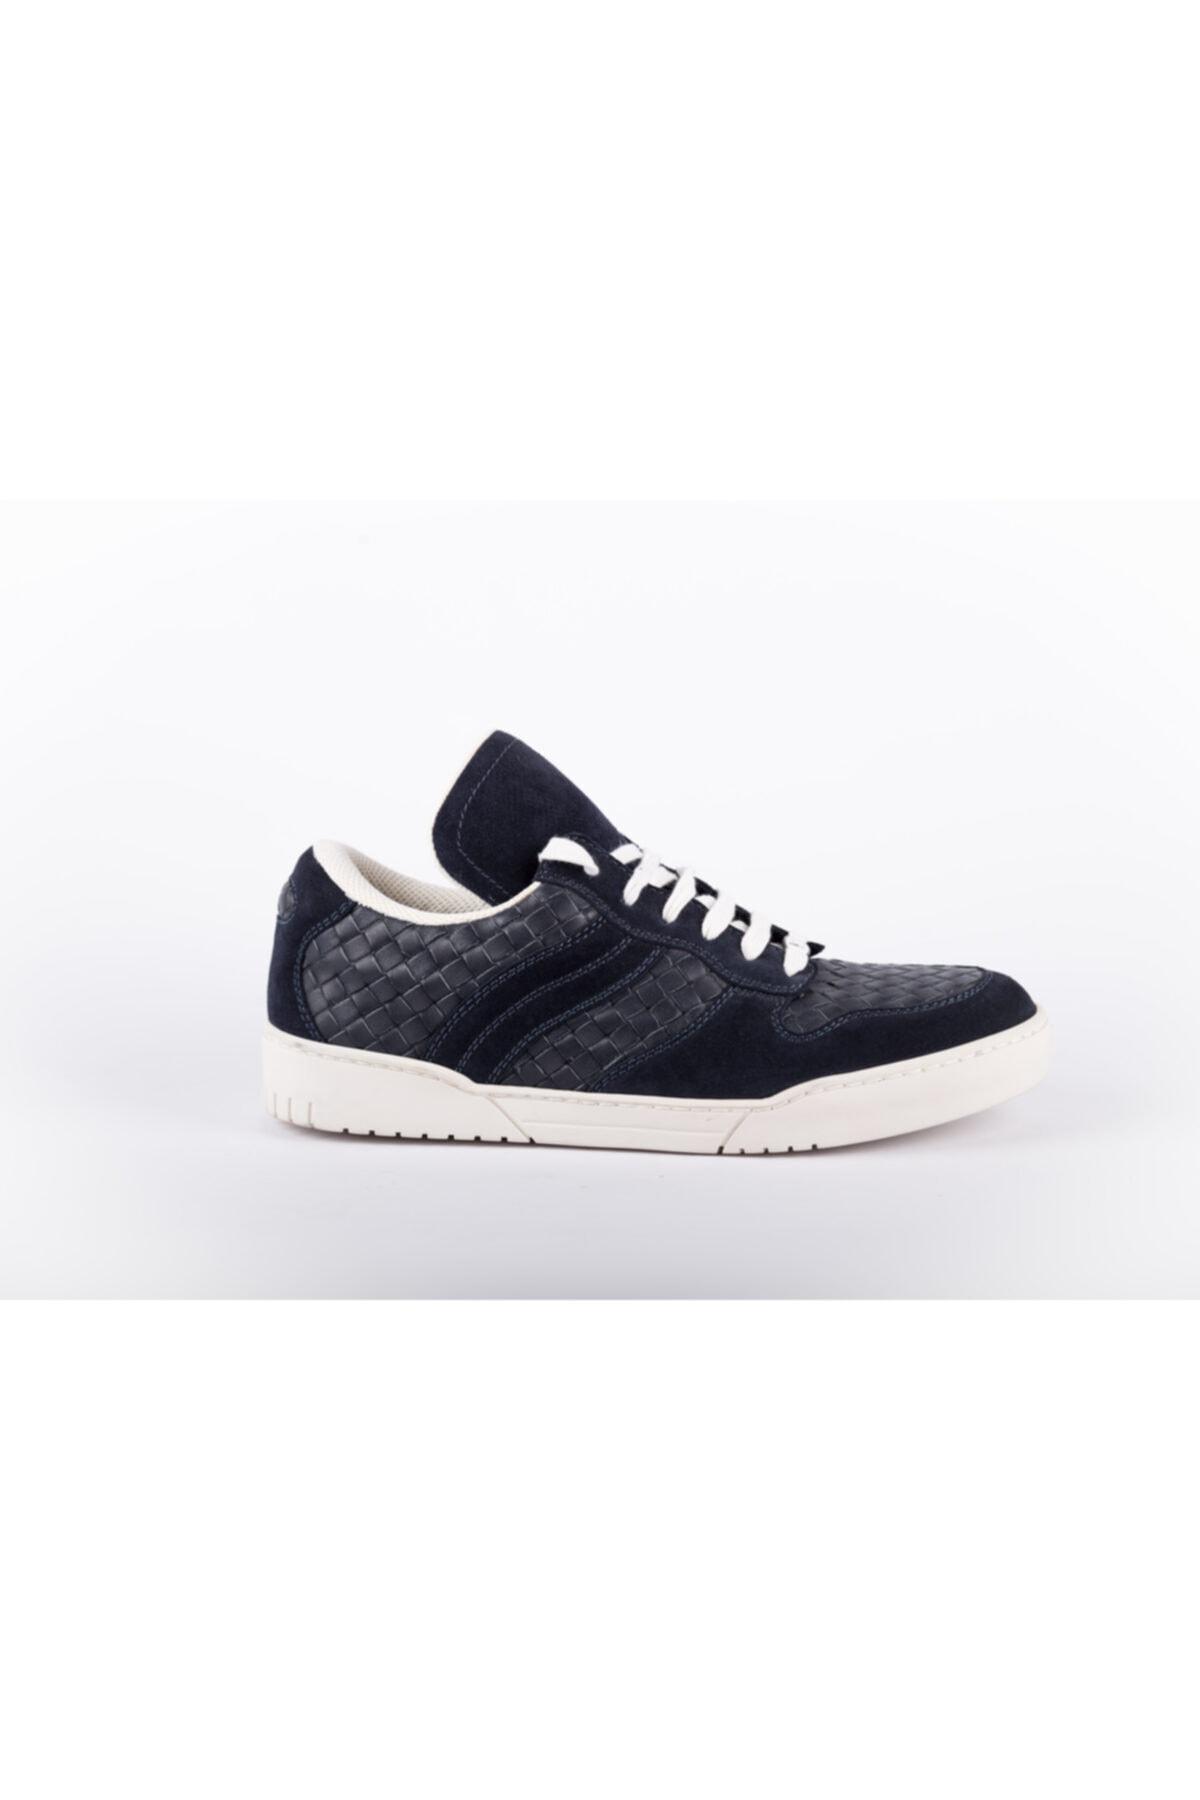 Bottega Veneta Sneakers 1